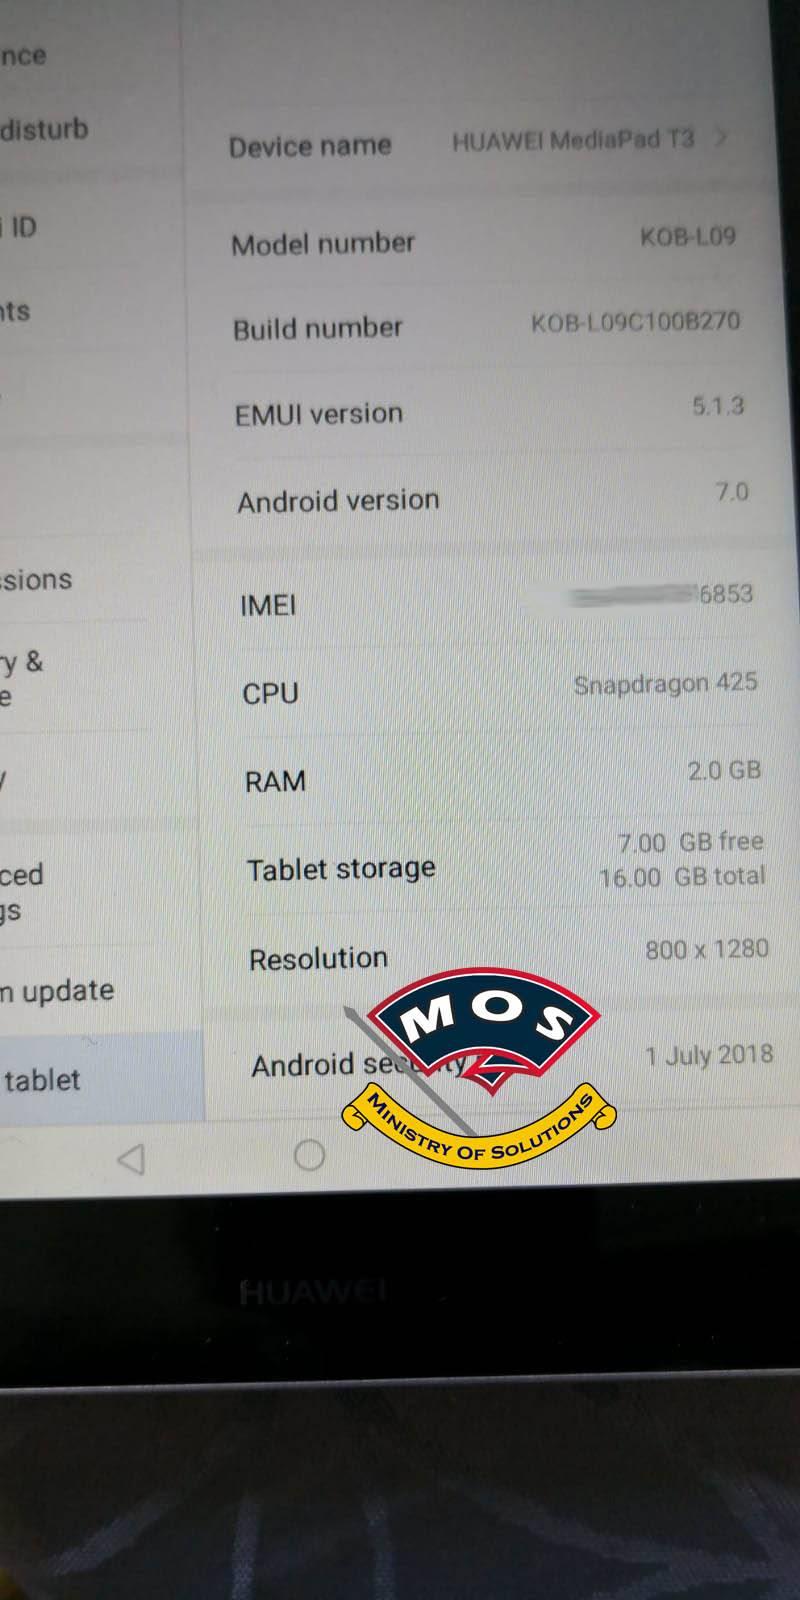 Huawei Mediapad T3 8 0 KOB-L09 KOB-W09 Rebrand (Remove Demo